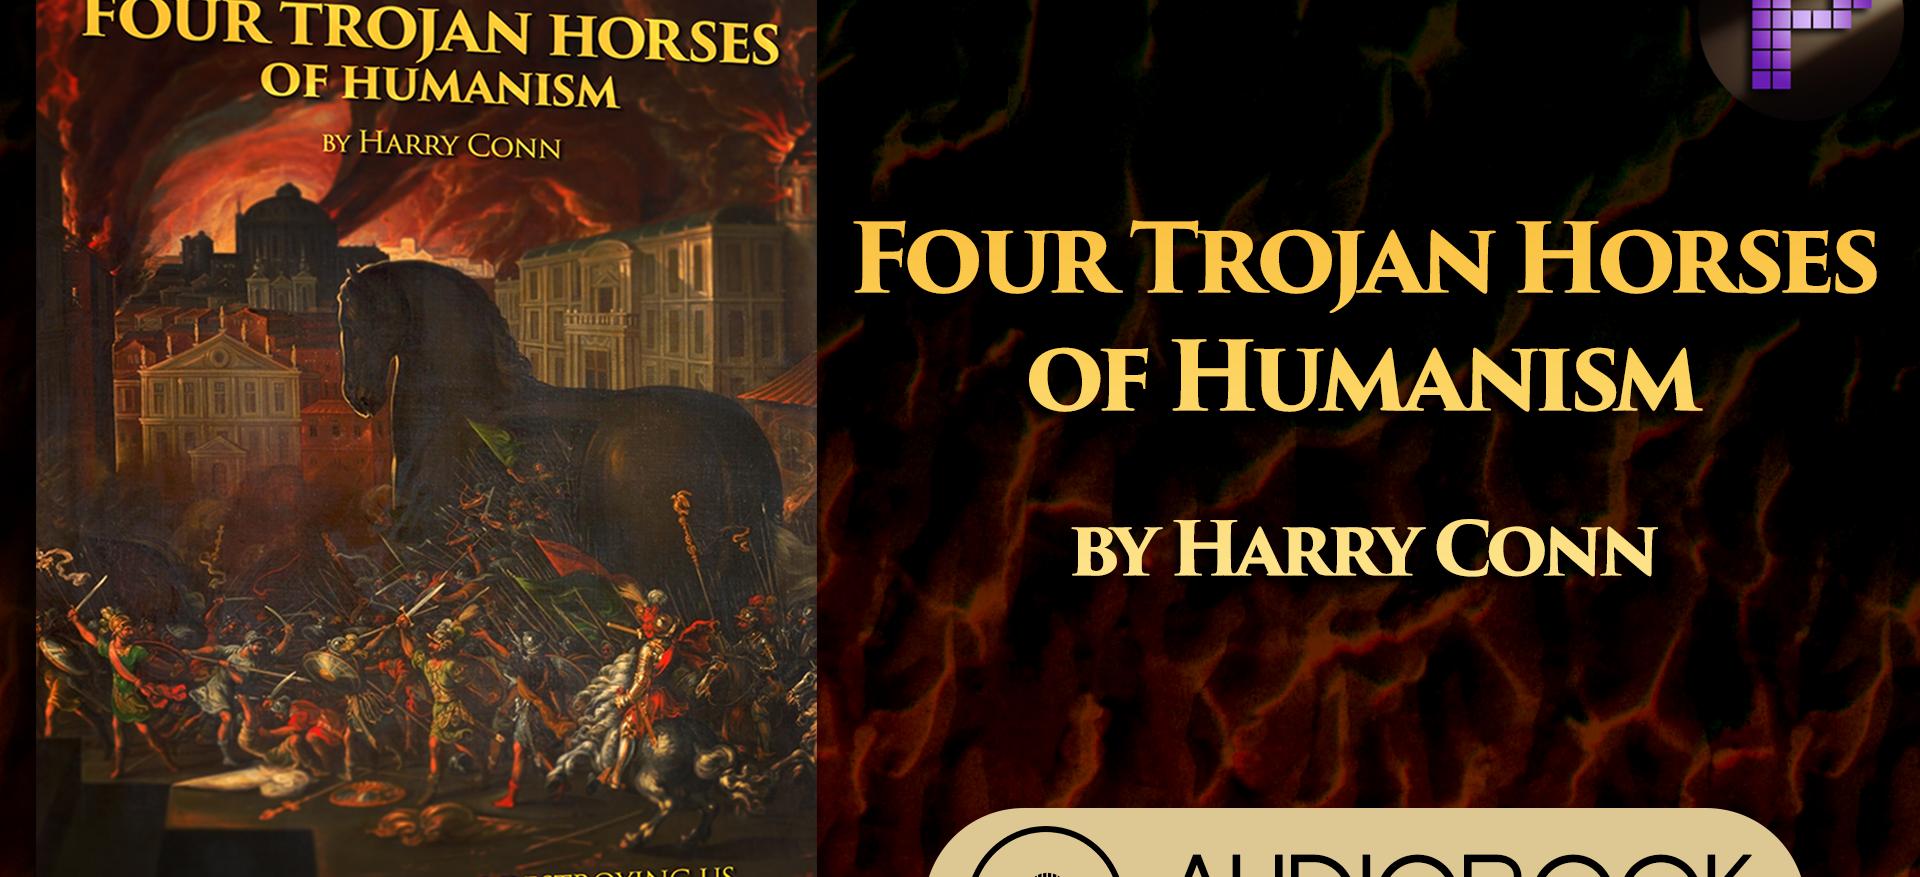 Four Trojan Horses of Humanism - Audiobook/eBook